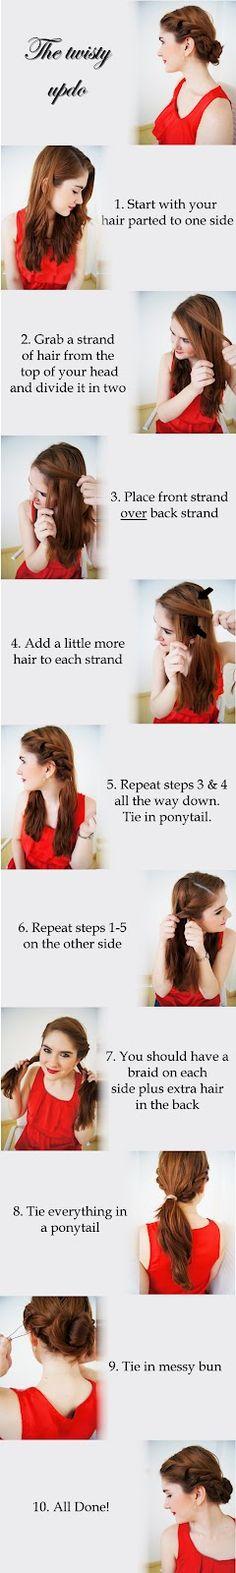 must try! looks so easy..